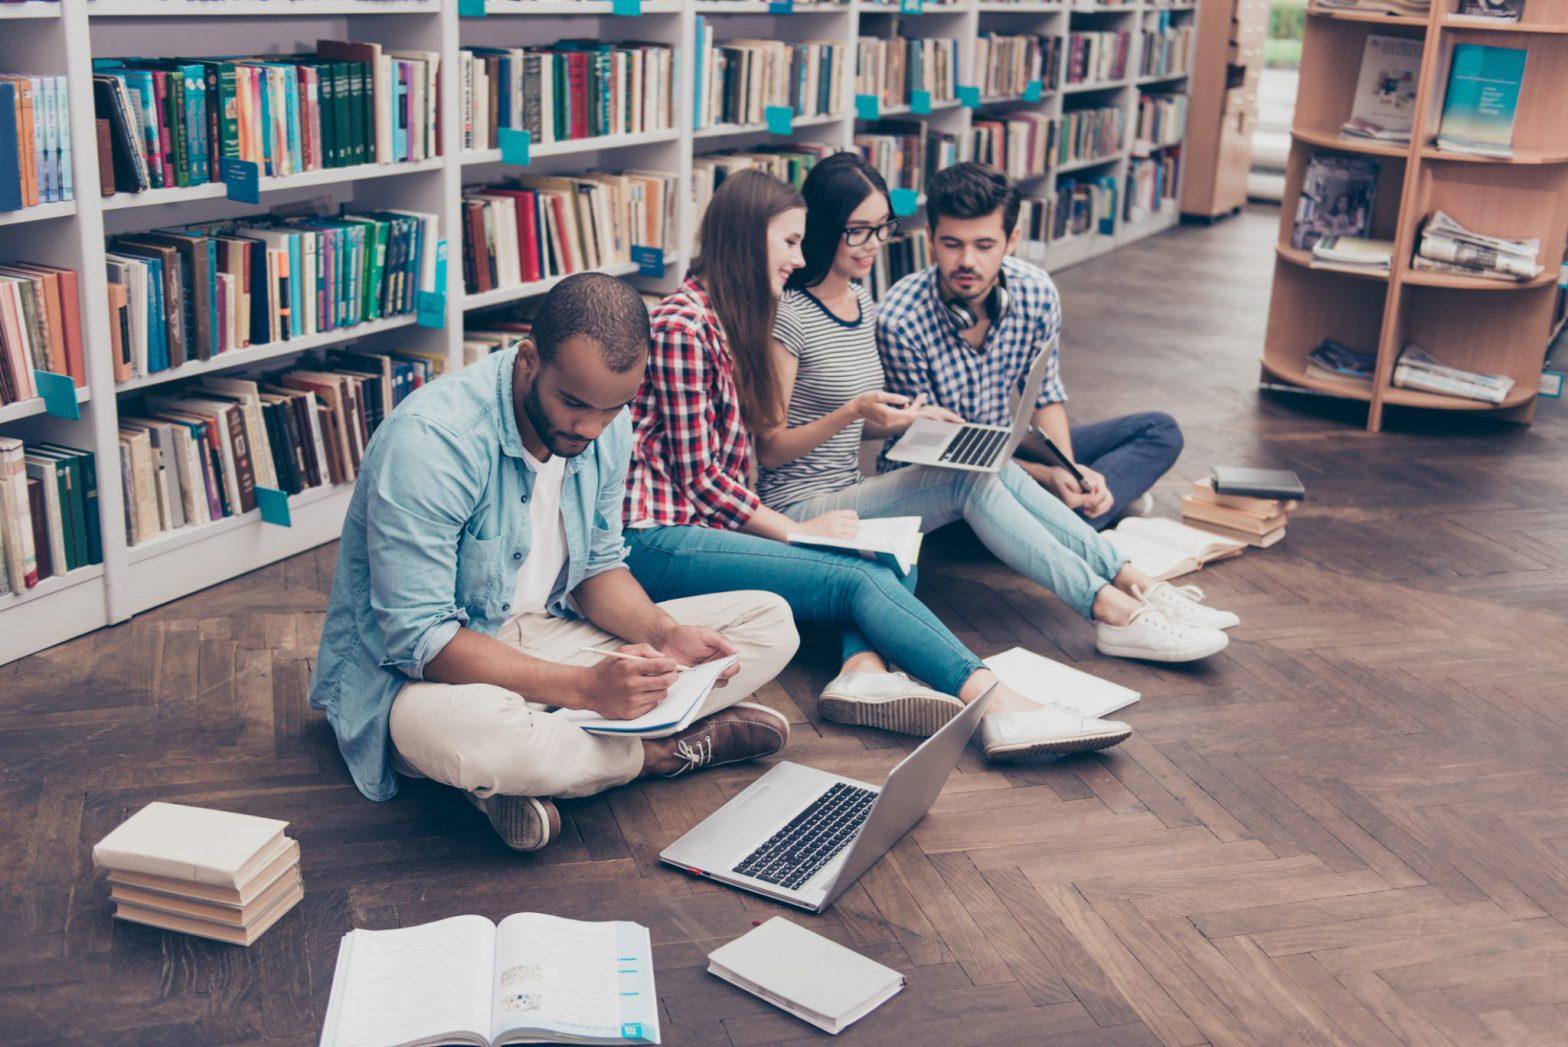 3 Big eLearning Myths Busted